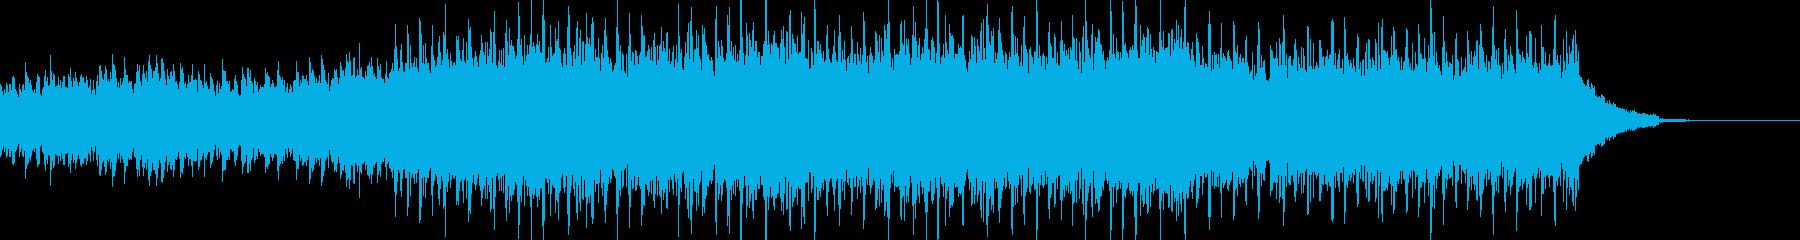 Dream popの再生済みの波形